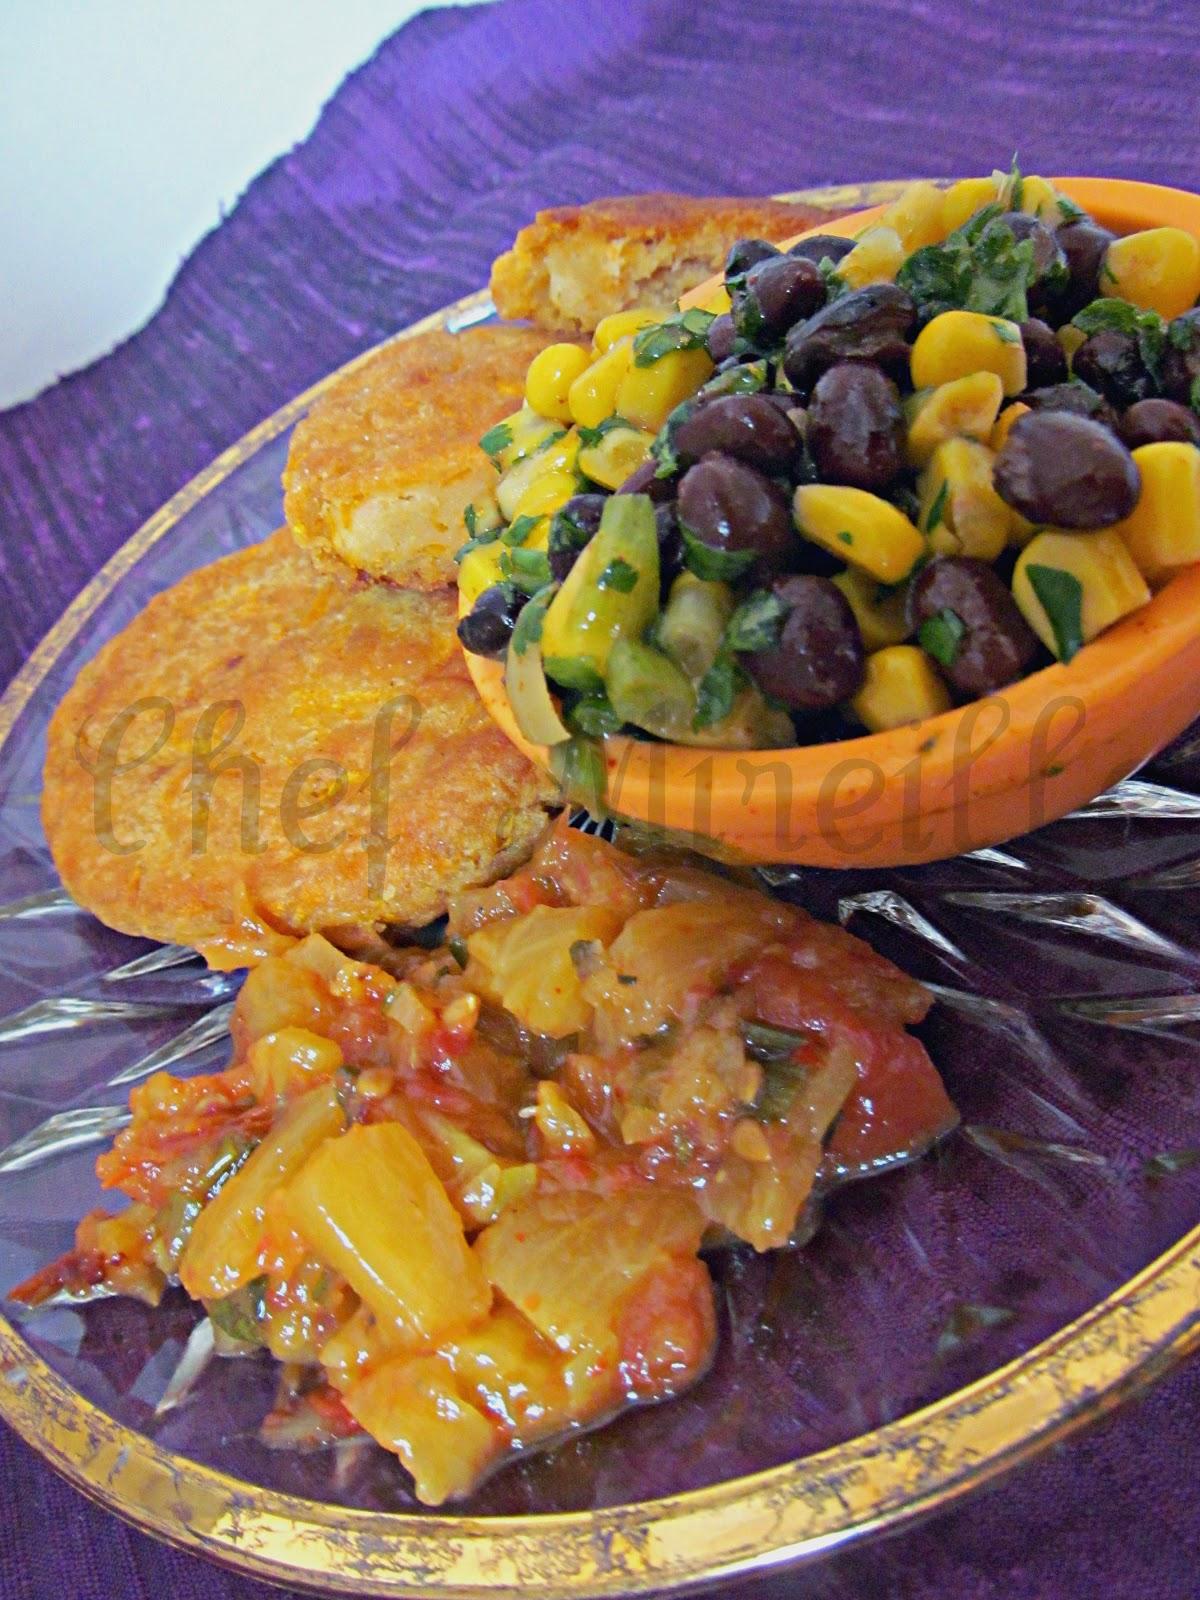 ... East West Realm: Pumpkin Arepas/ Arepas de Calabaza & Black Bean Salad